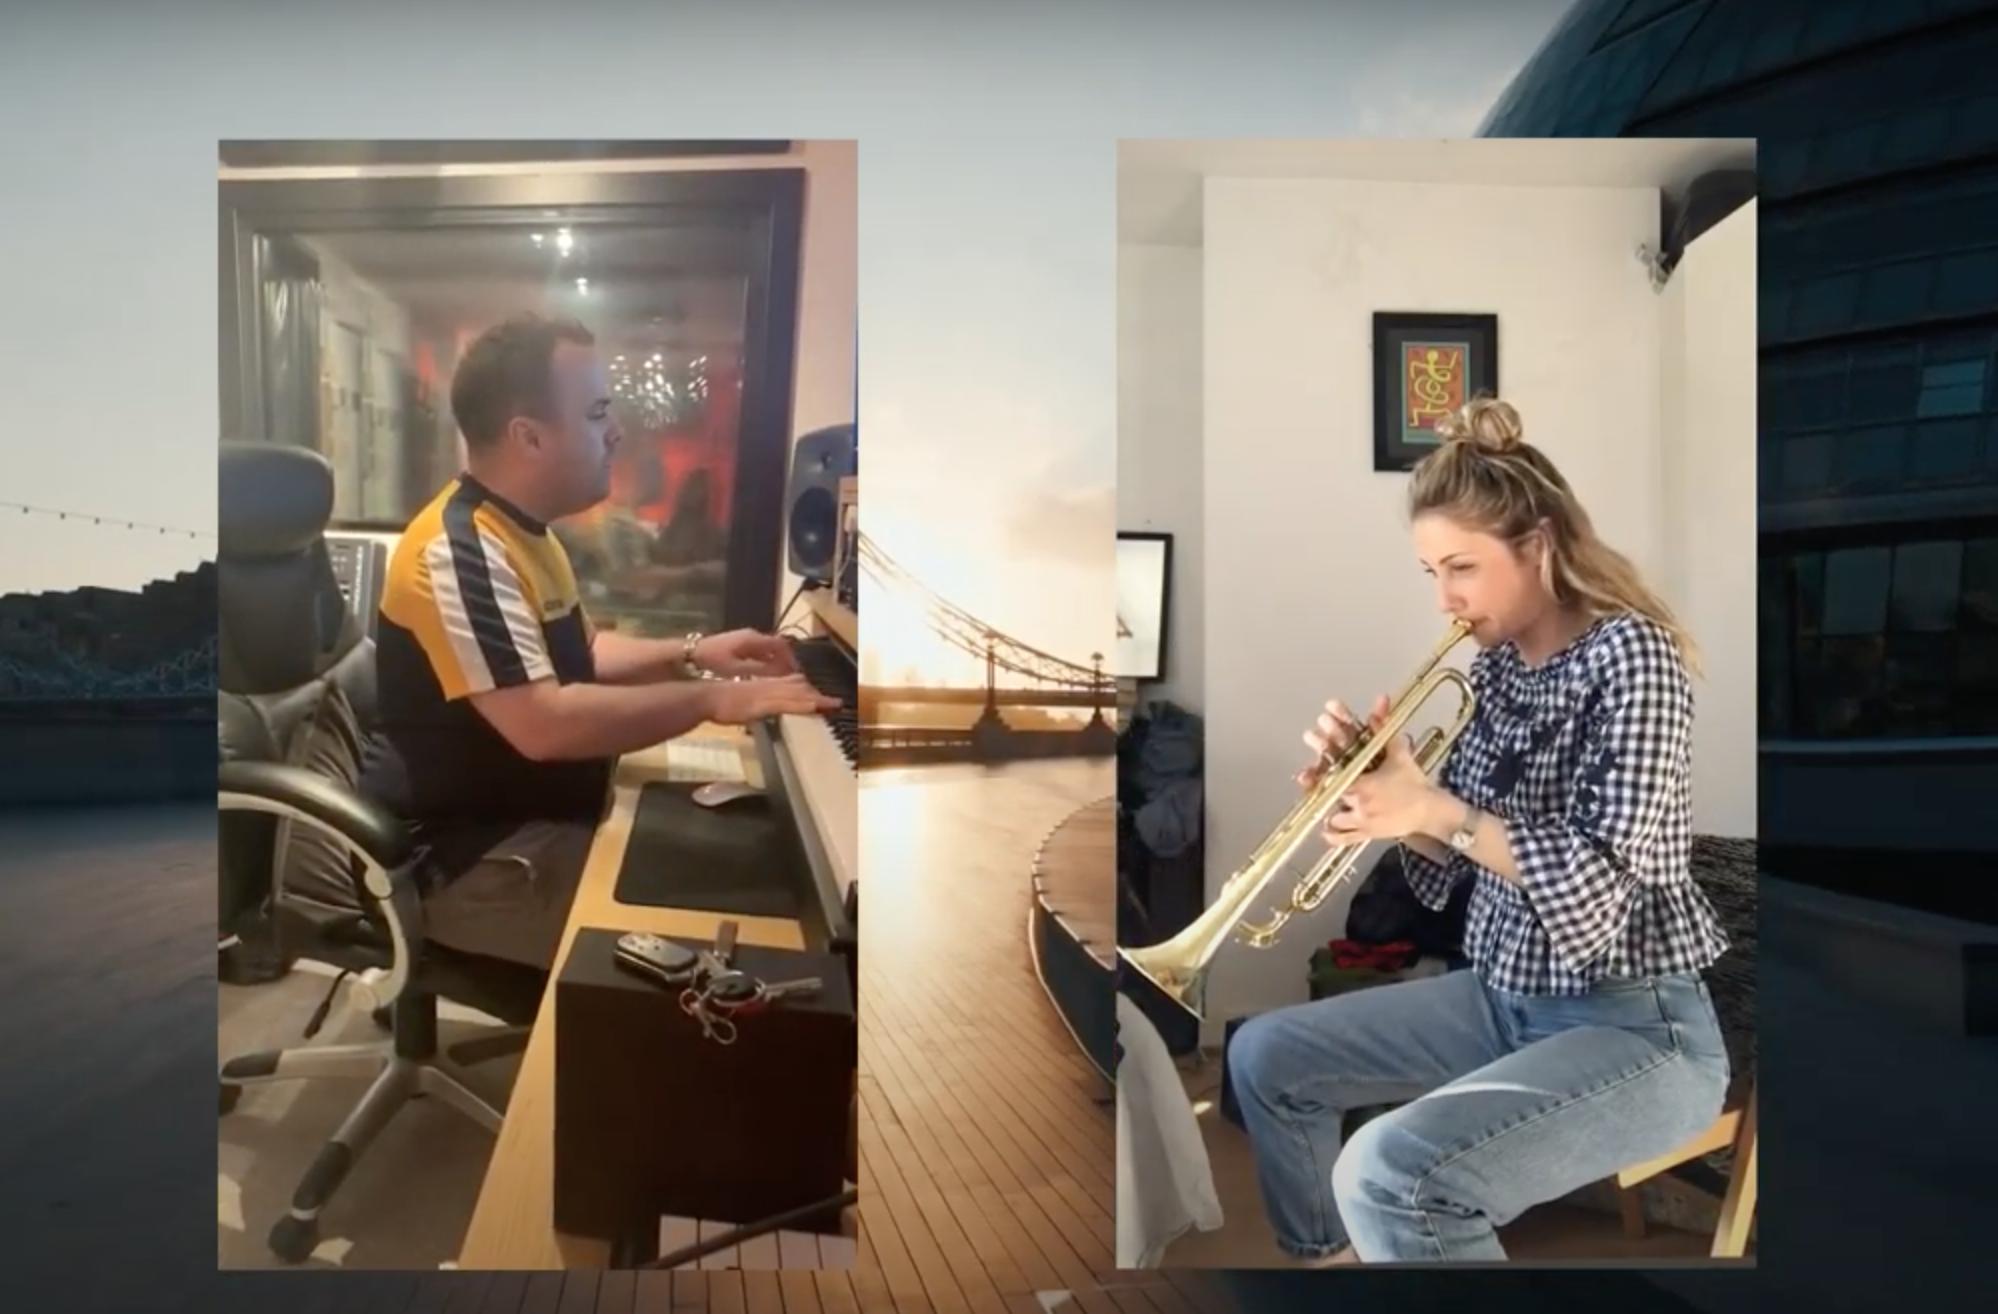 MUSICIANS VIRAL VIDEO COVID